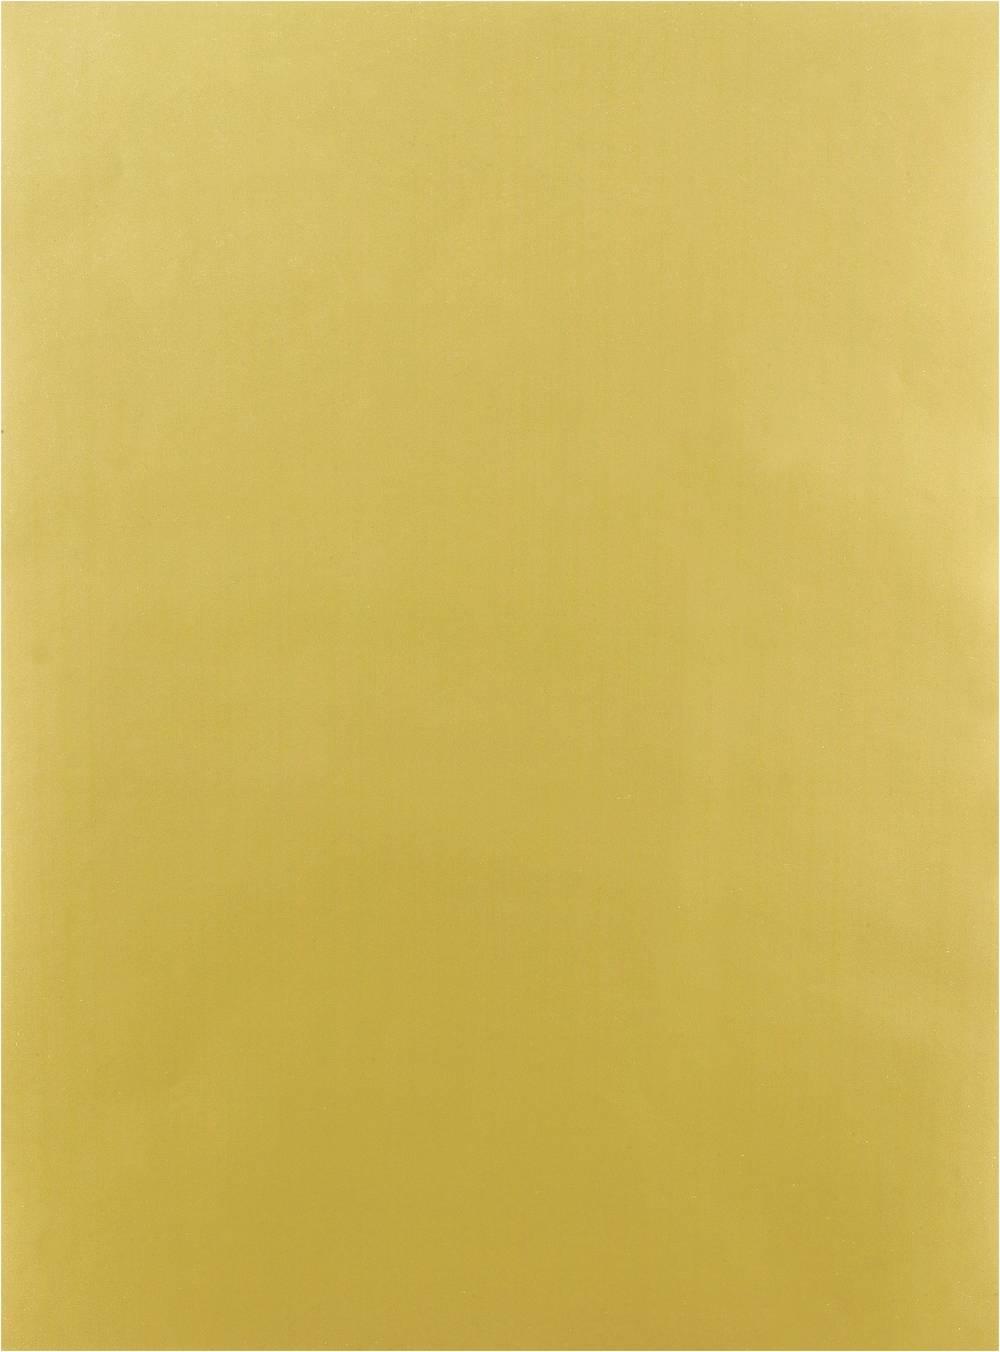 Polyesterfolie Belagt, Selvklæbende Guld (L x B) 297 mm x 210 mm 1 stk